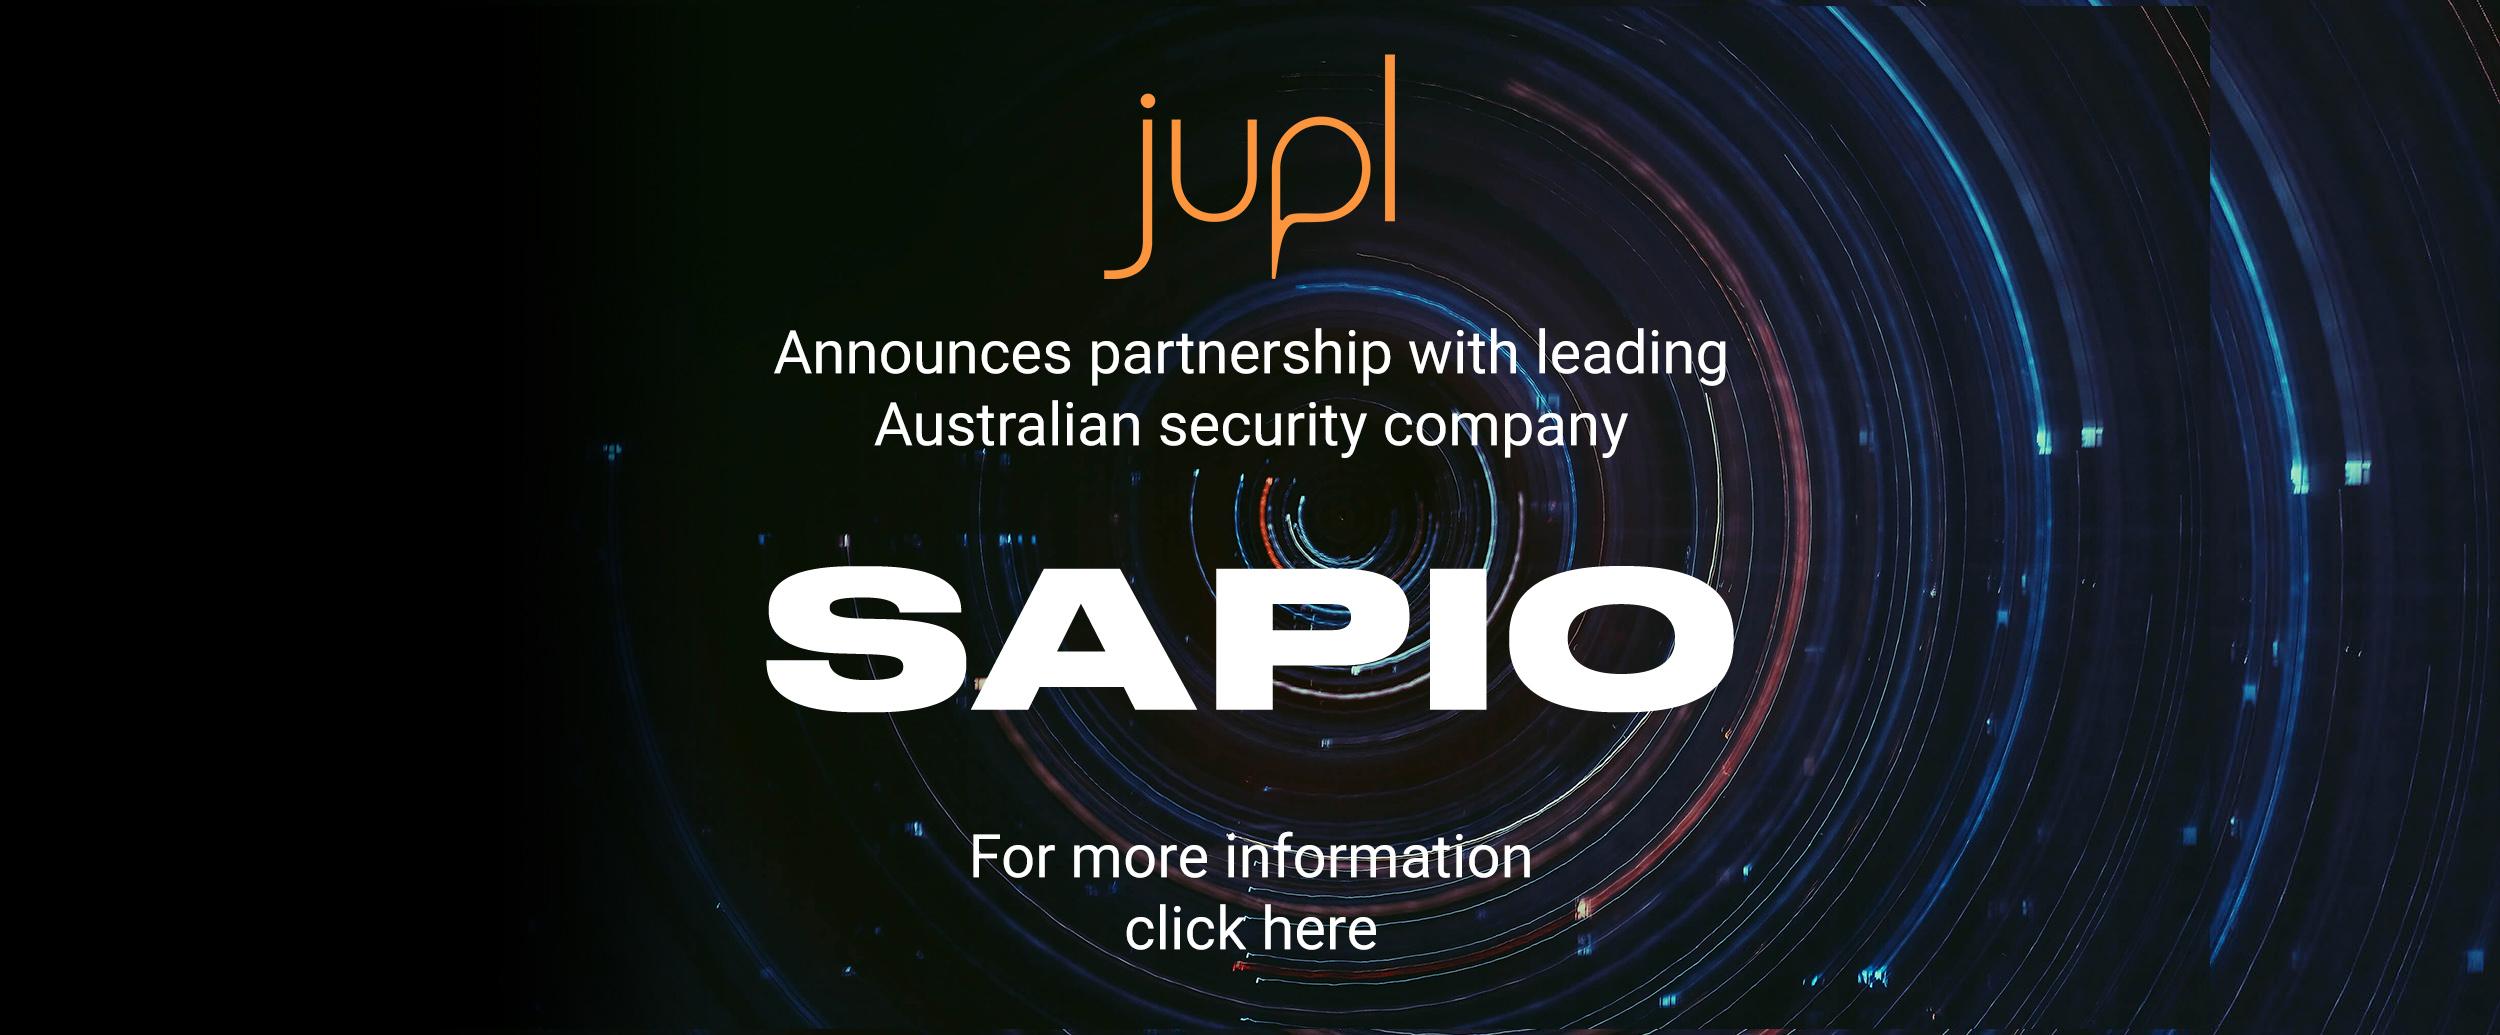 Sapio Announcement copy.jpg